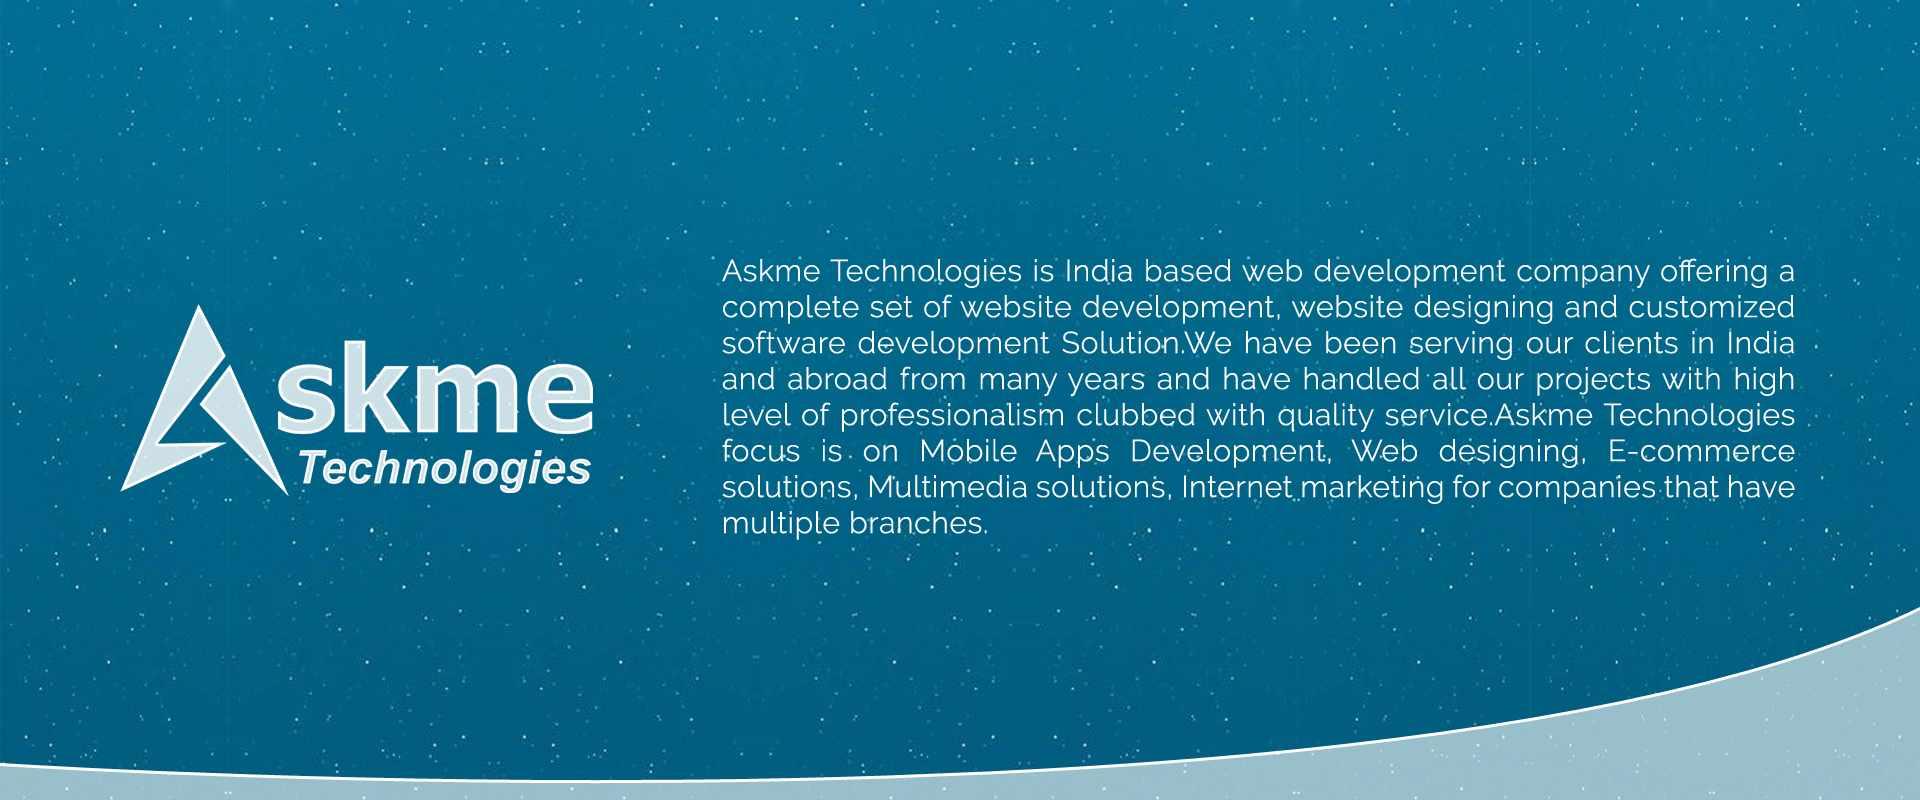 Website Design & Web Development Company in India - Askme